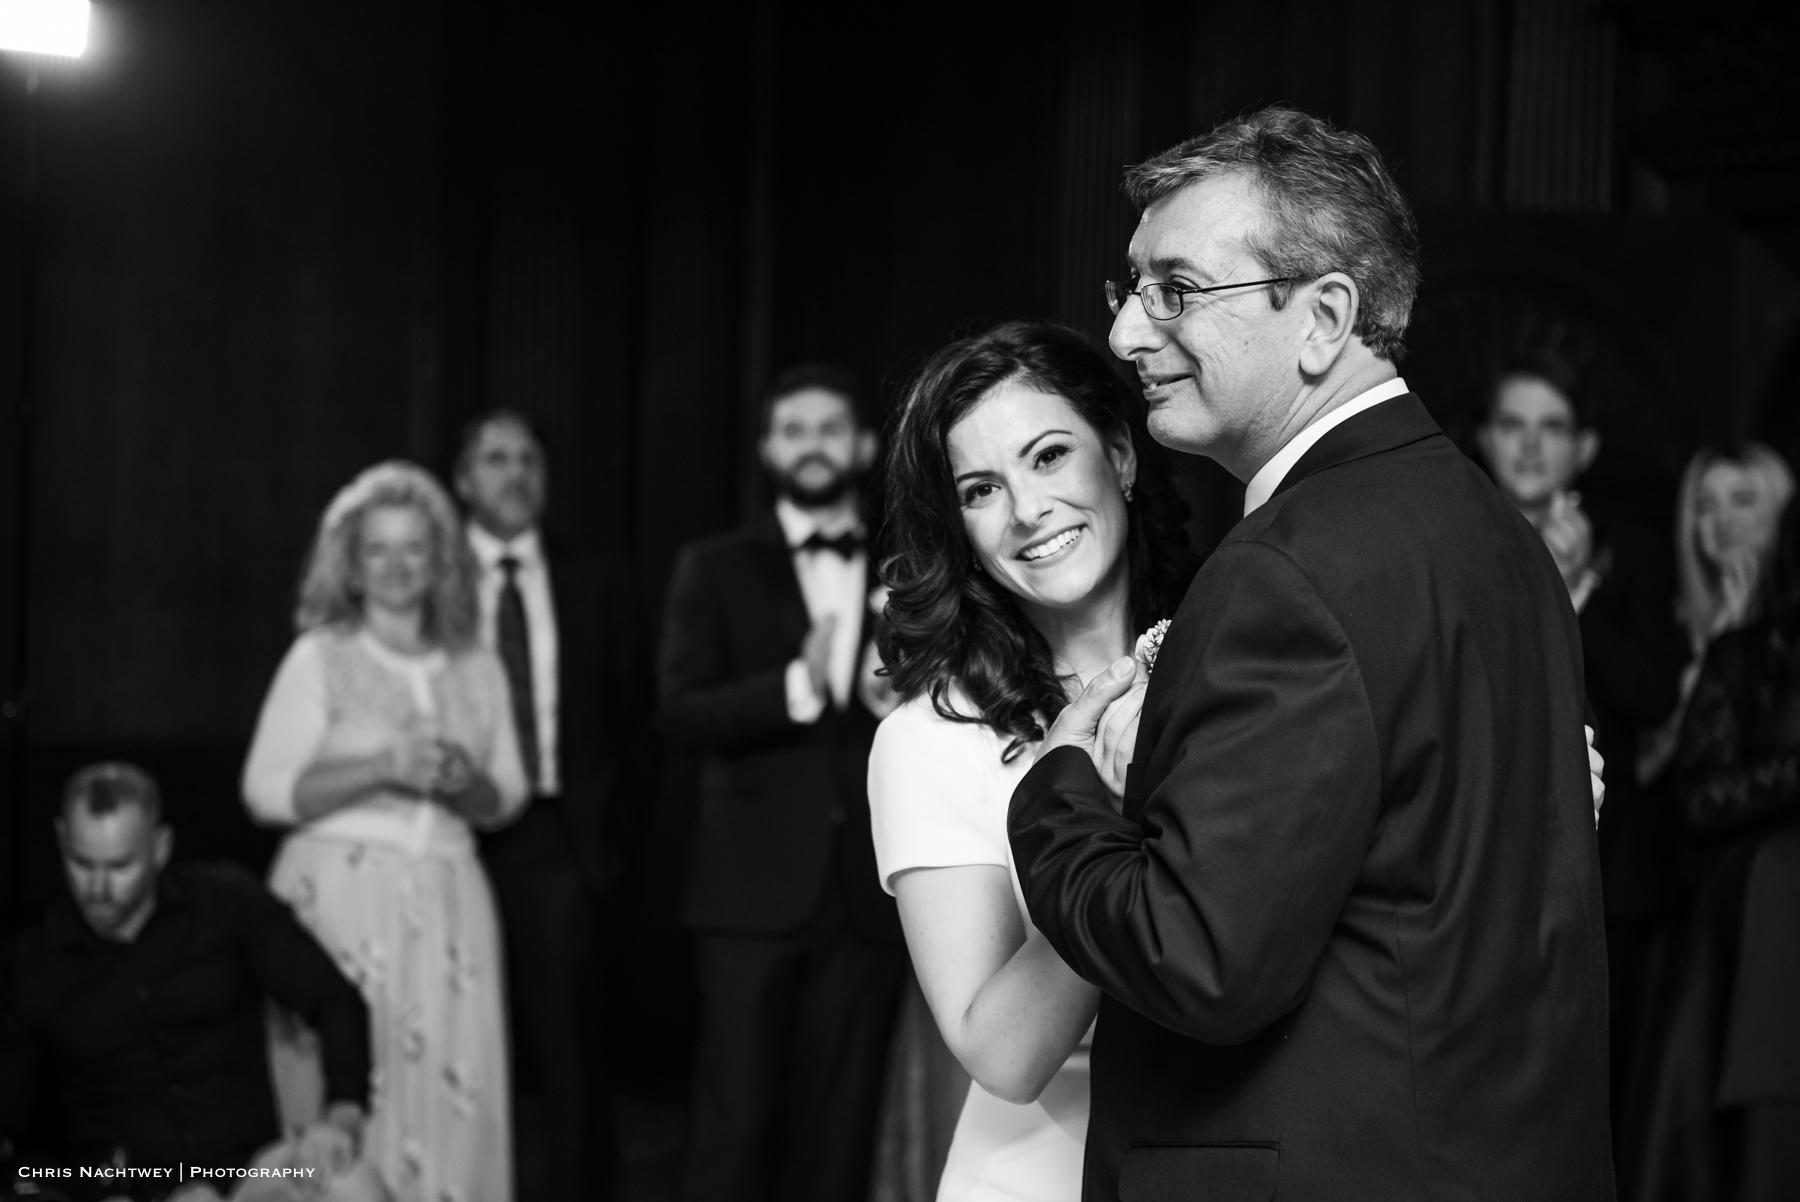 winter-branford-house-wedding-photos-groton-ct-chris-nachtwey-photography-2019-43.jpg